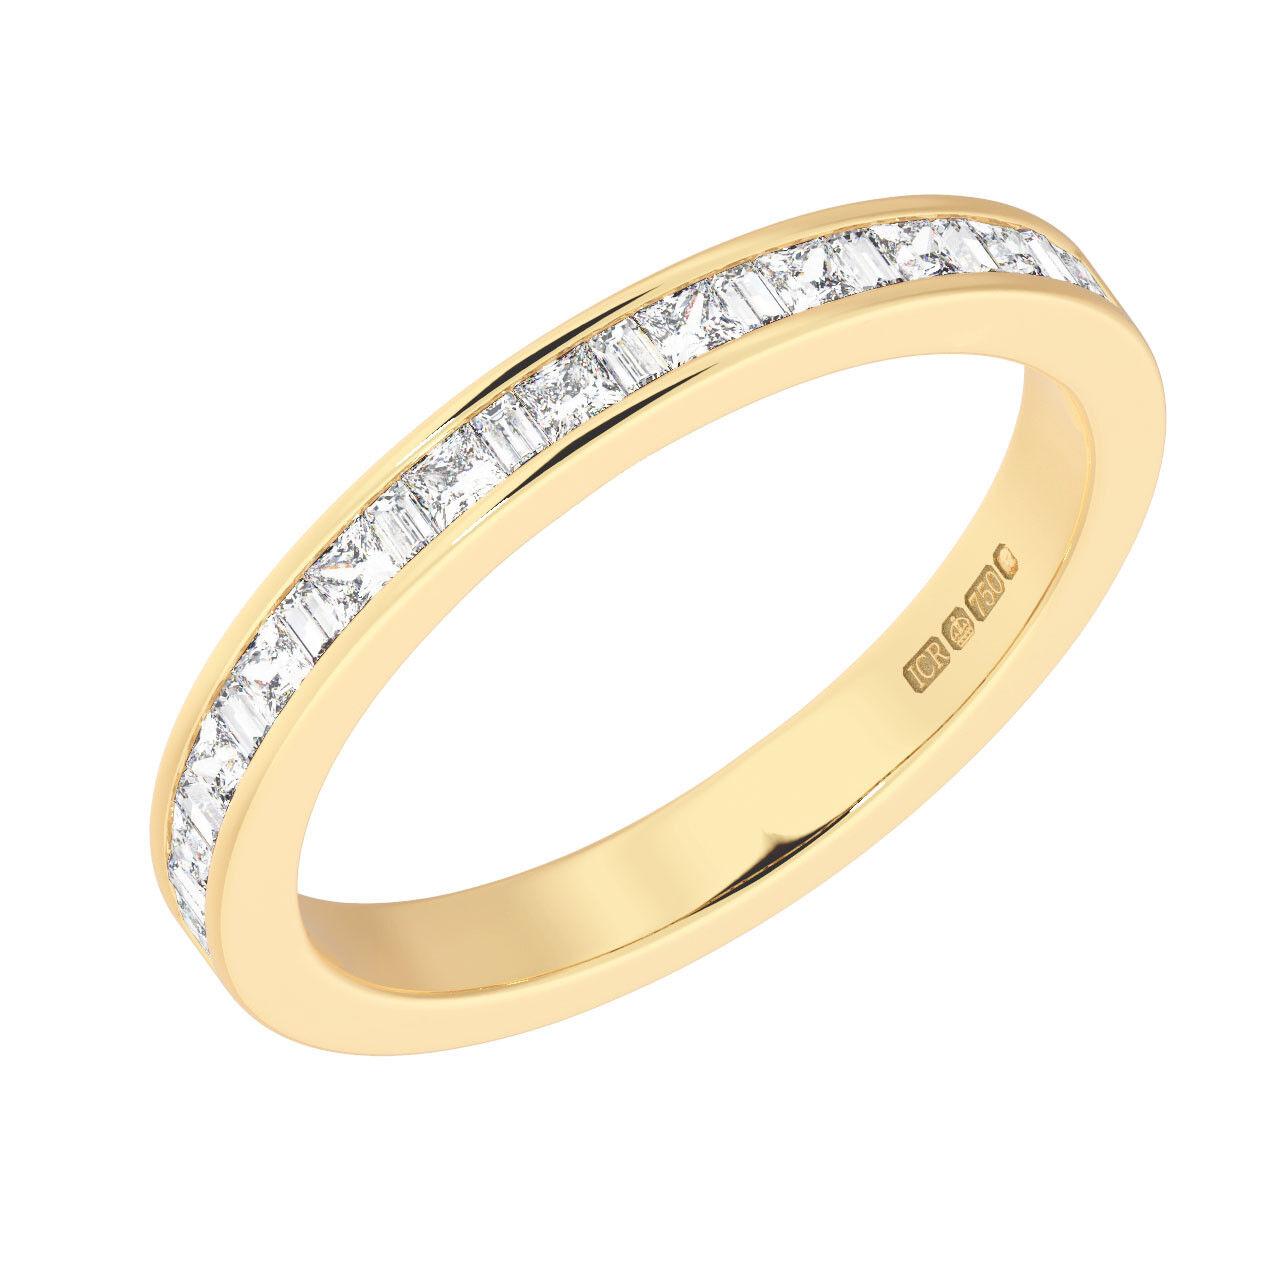 0.35CT Princess & Baguette Cut Diamonds Half Eternity Ring in 9K Yellow gold